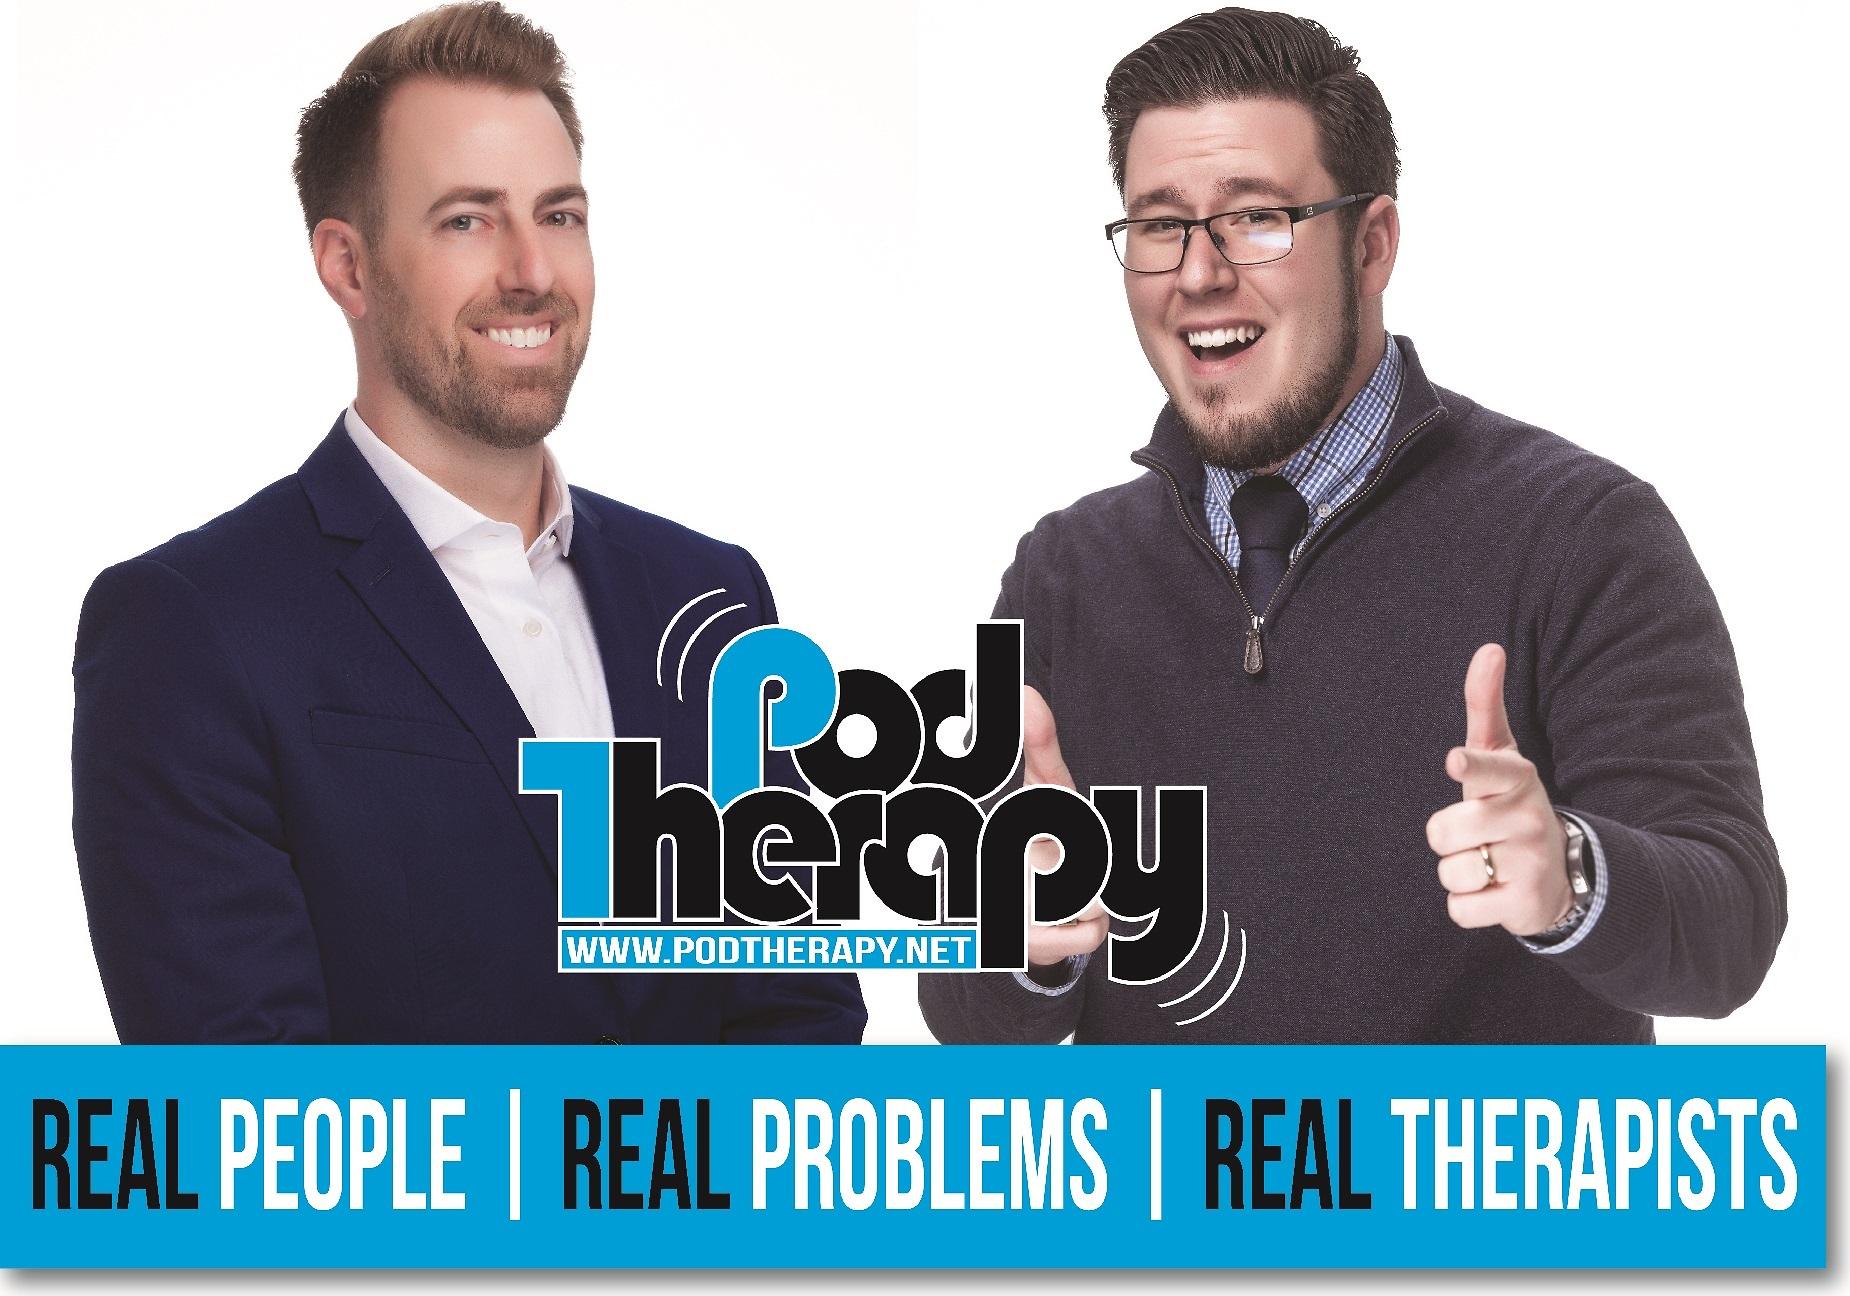 pod therapy logo.jpg